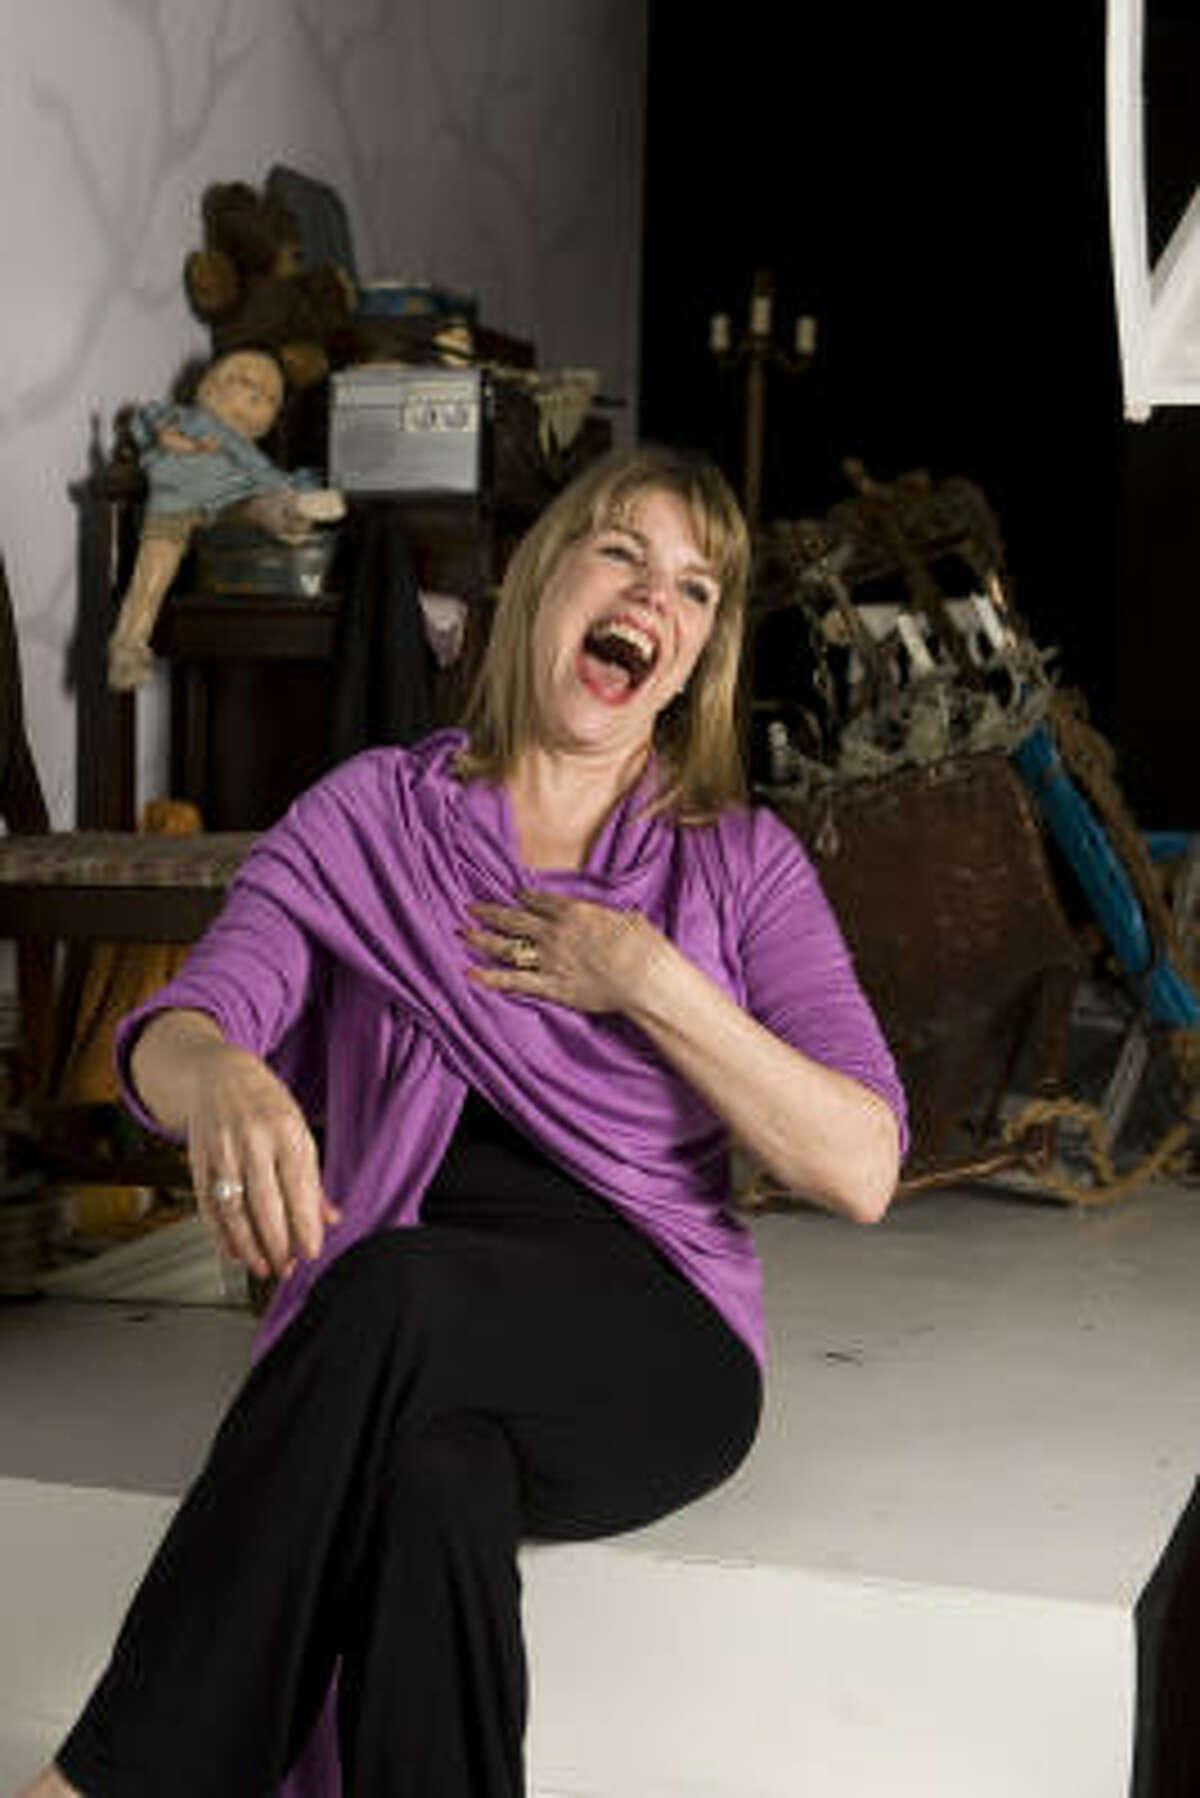 Nancy Johnston plays Edith Bouvier Beale/